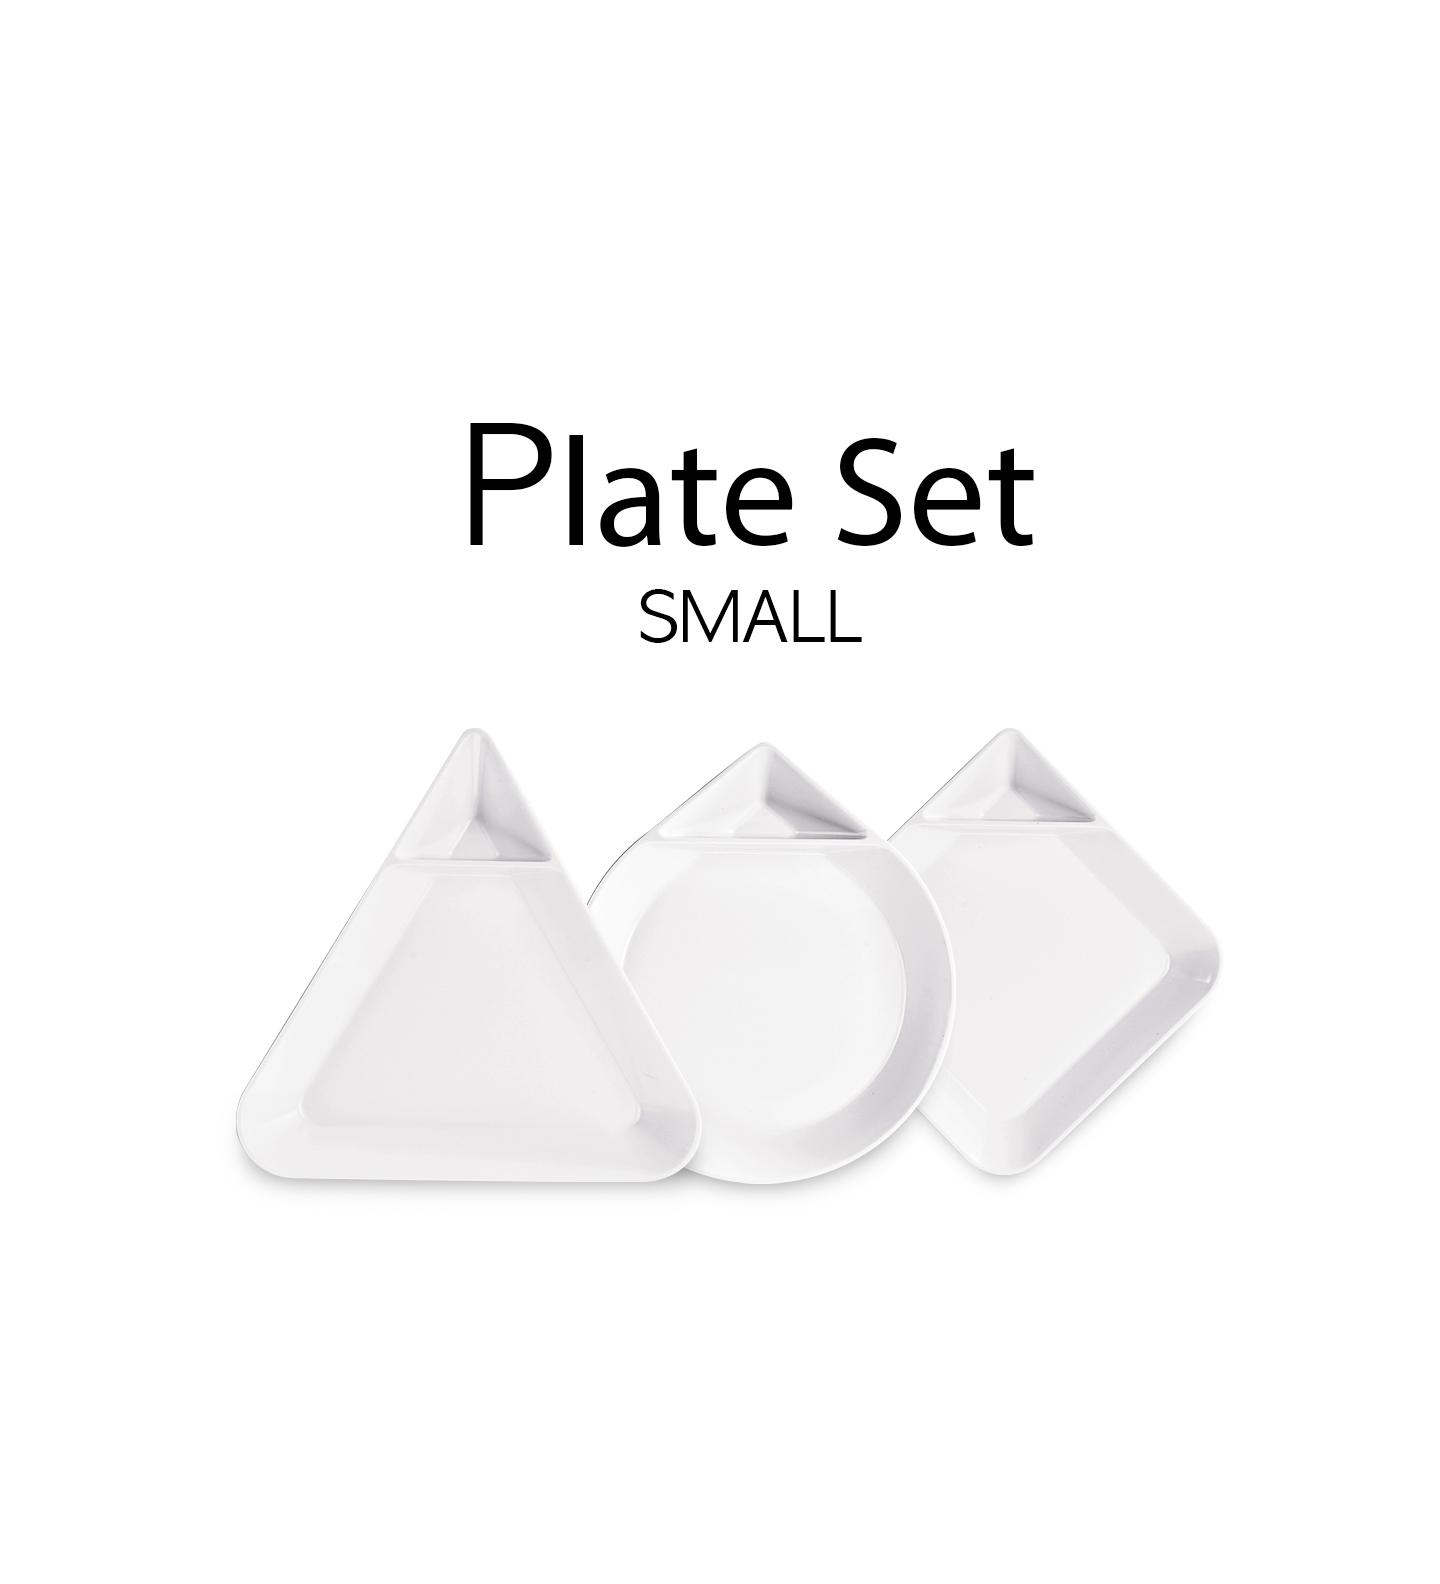 Plate Set Small 03